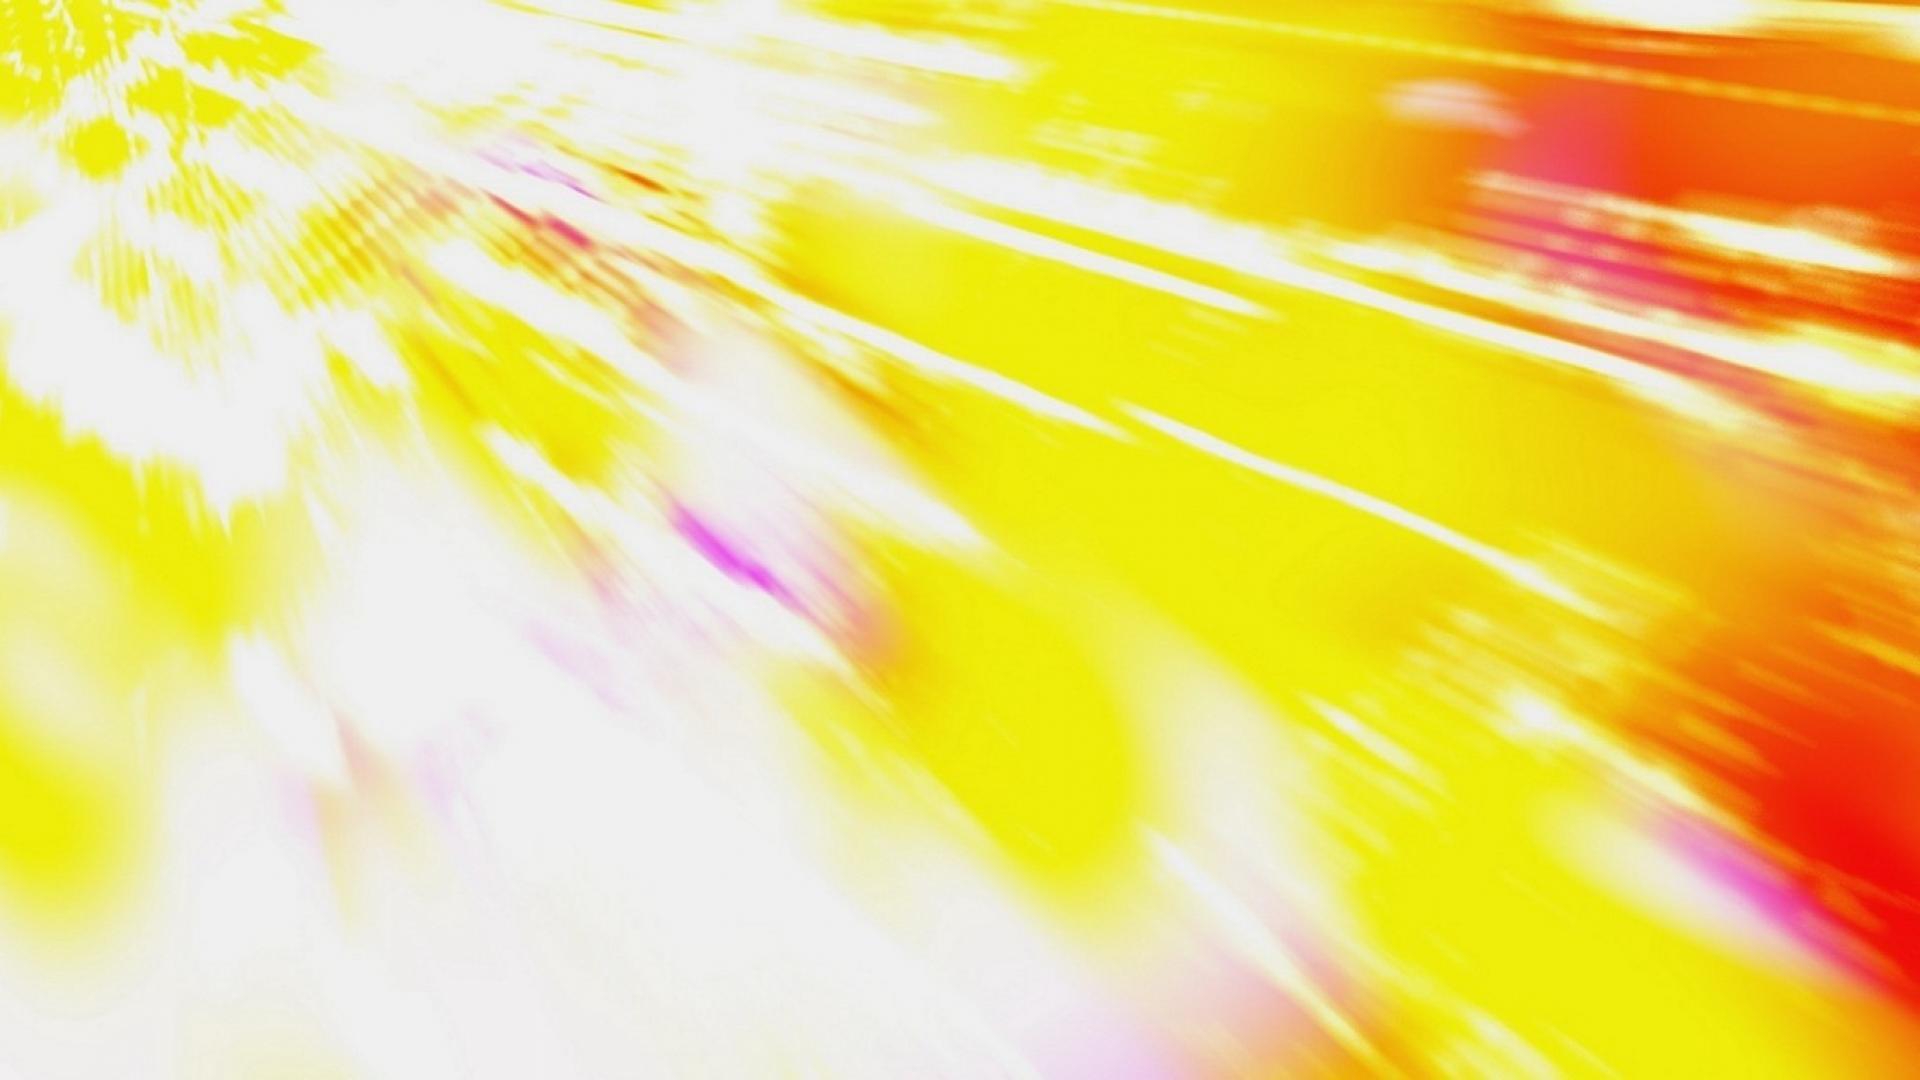 Color splash wallpaper 36163 1920x1080